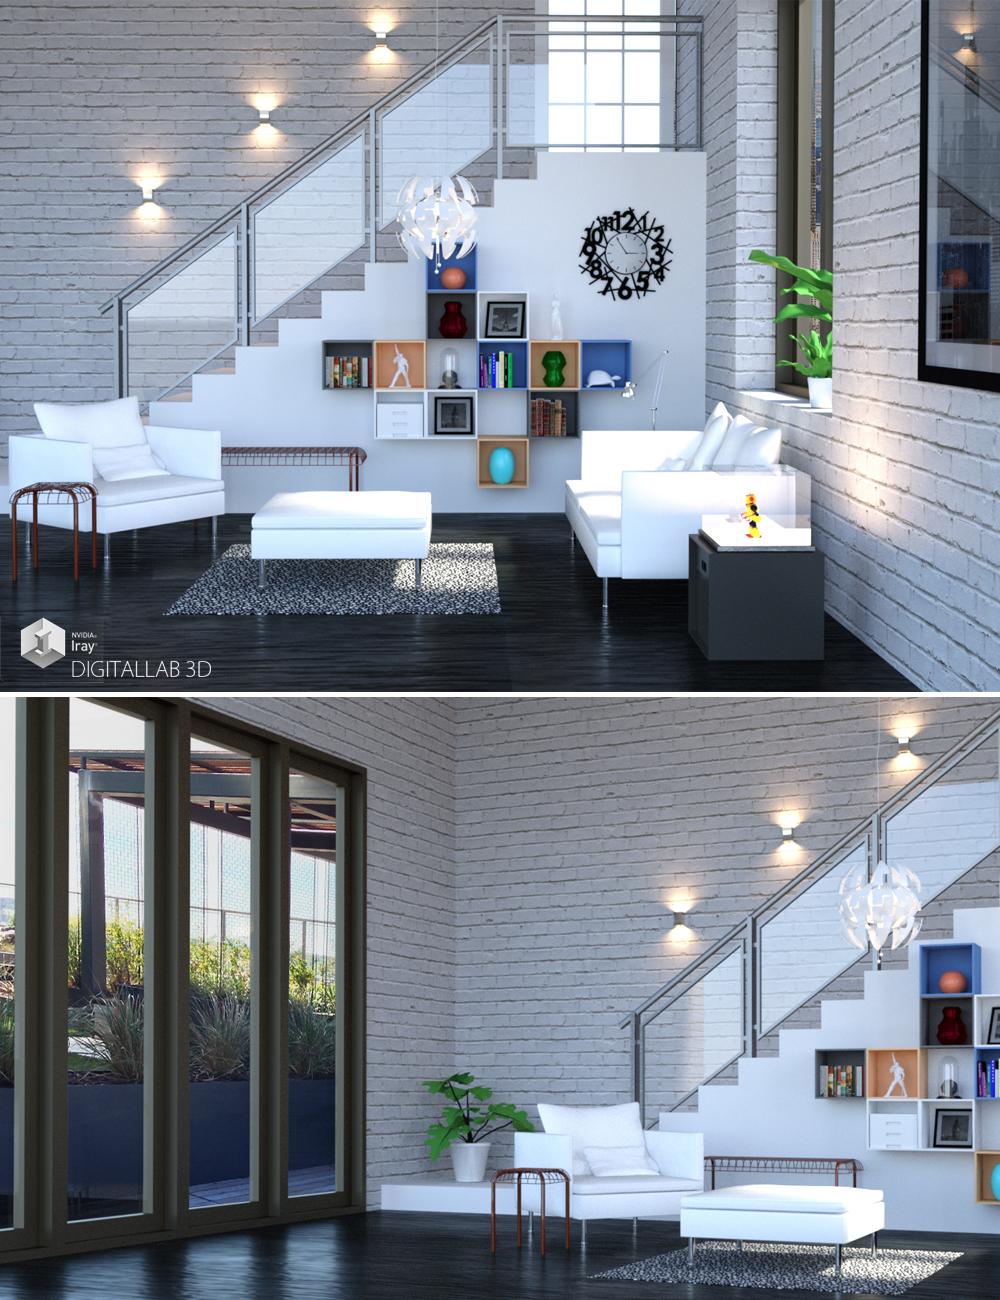 California Living Room by: Digitallab3D, 3D Models by Daz 3D